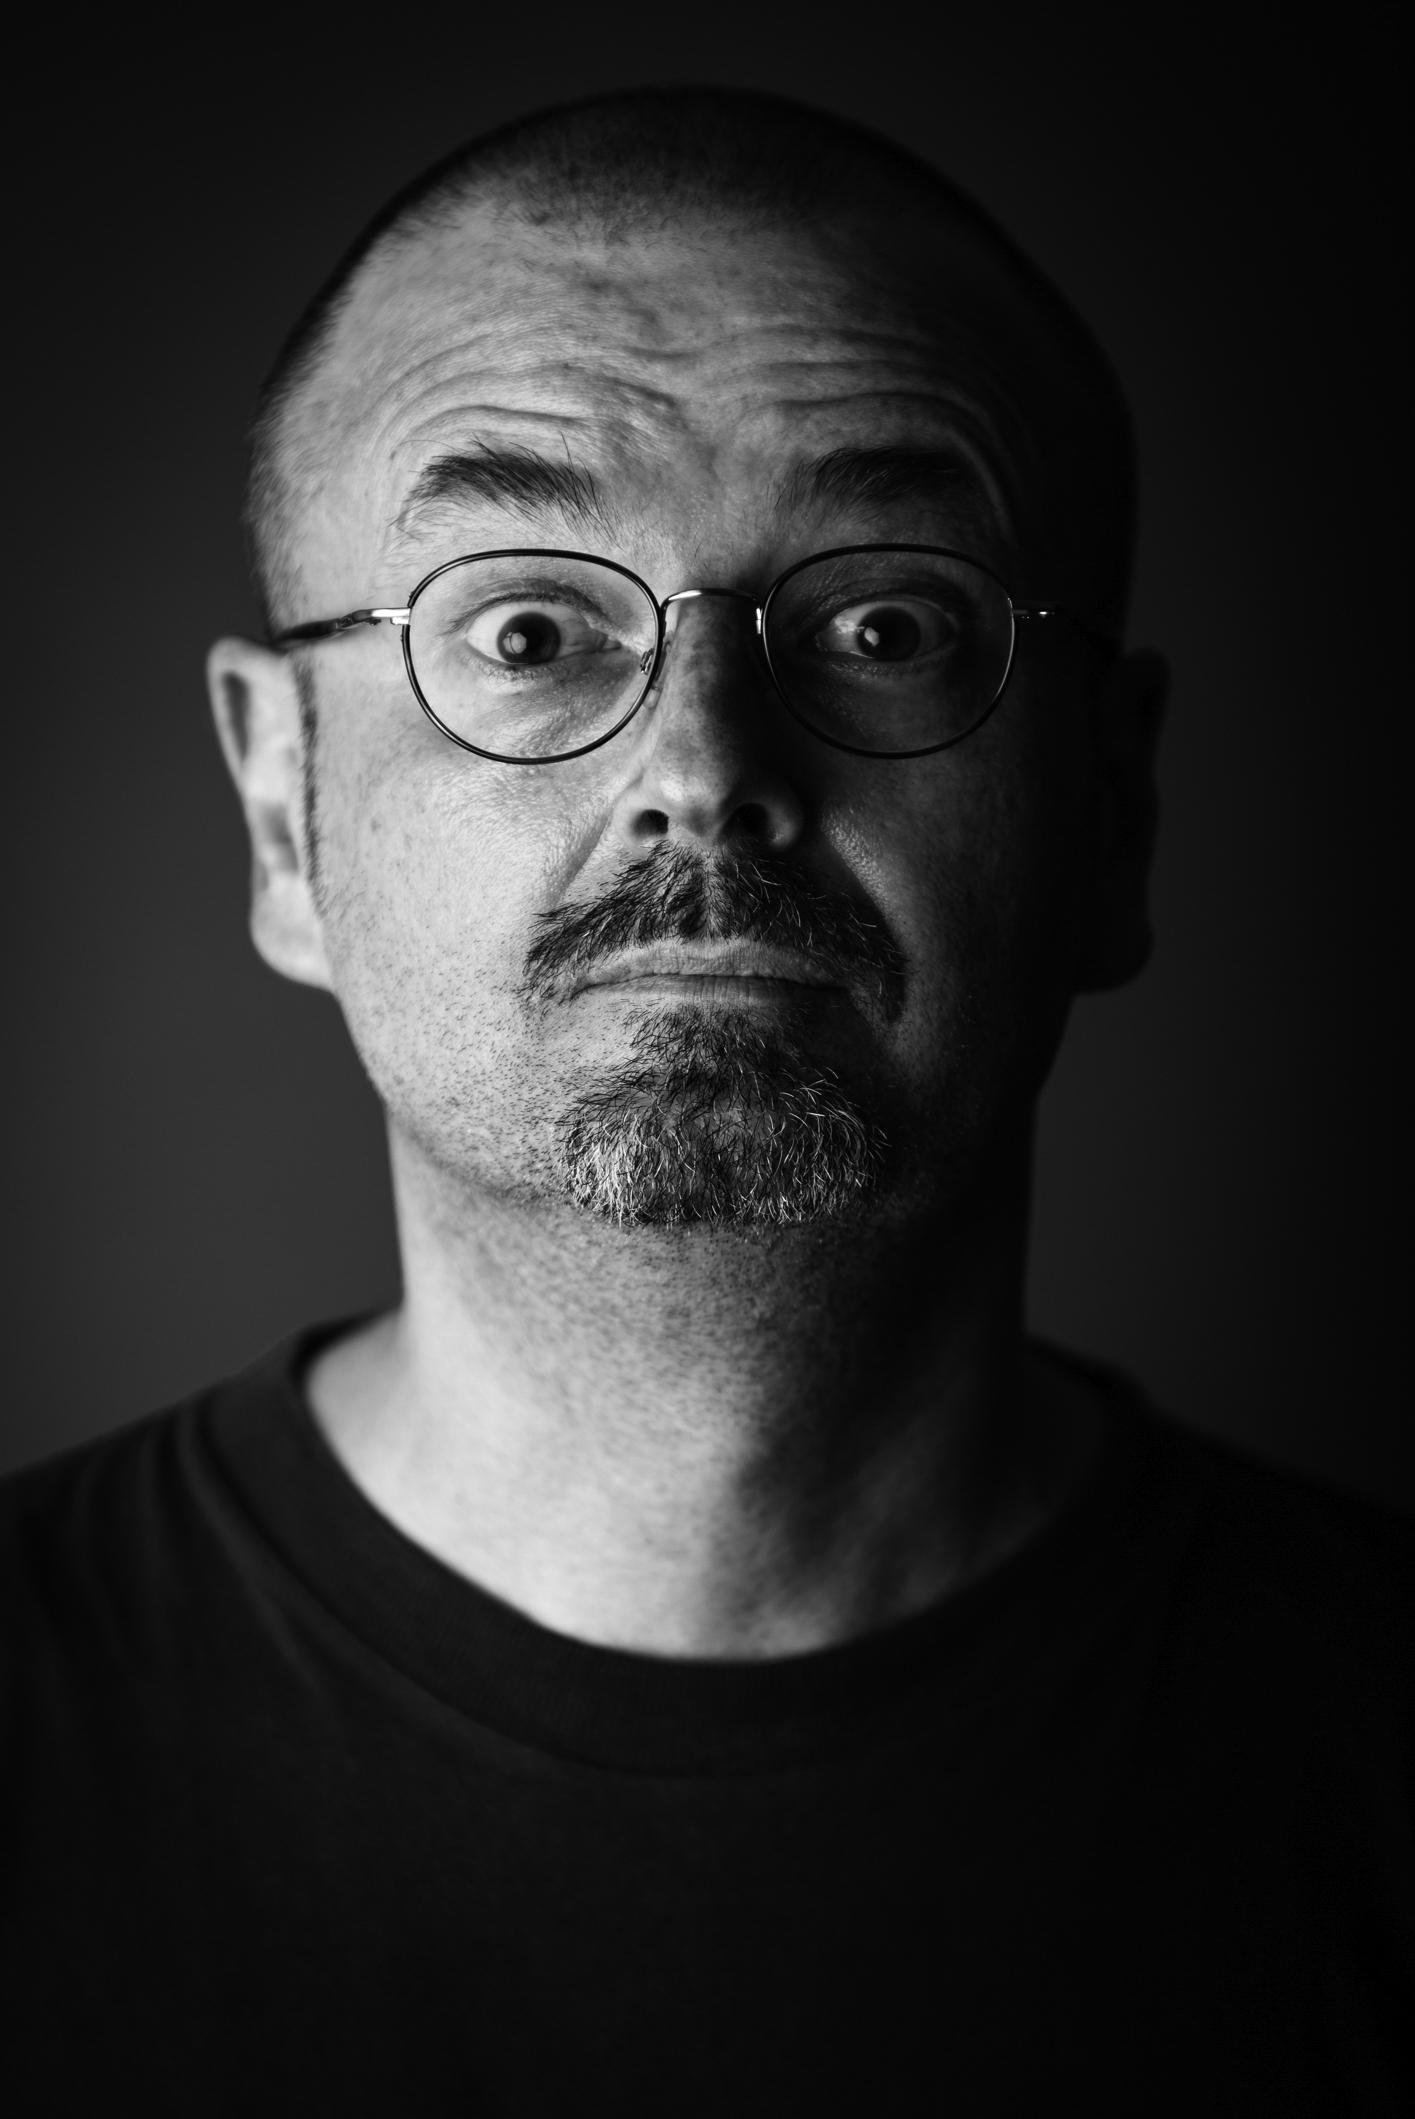 Stefano Bagnoli